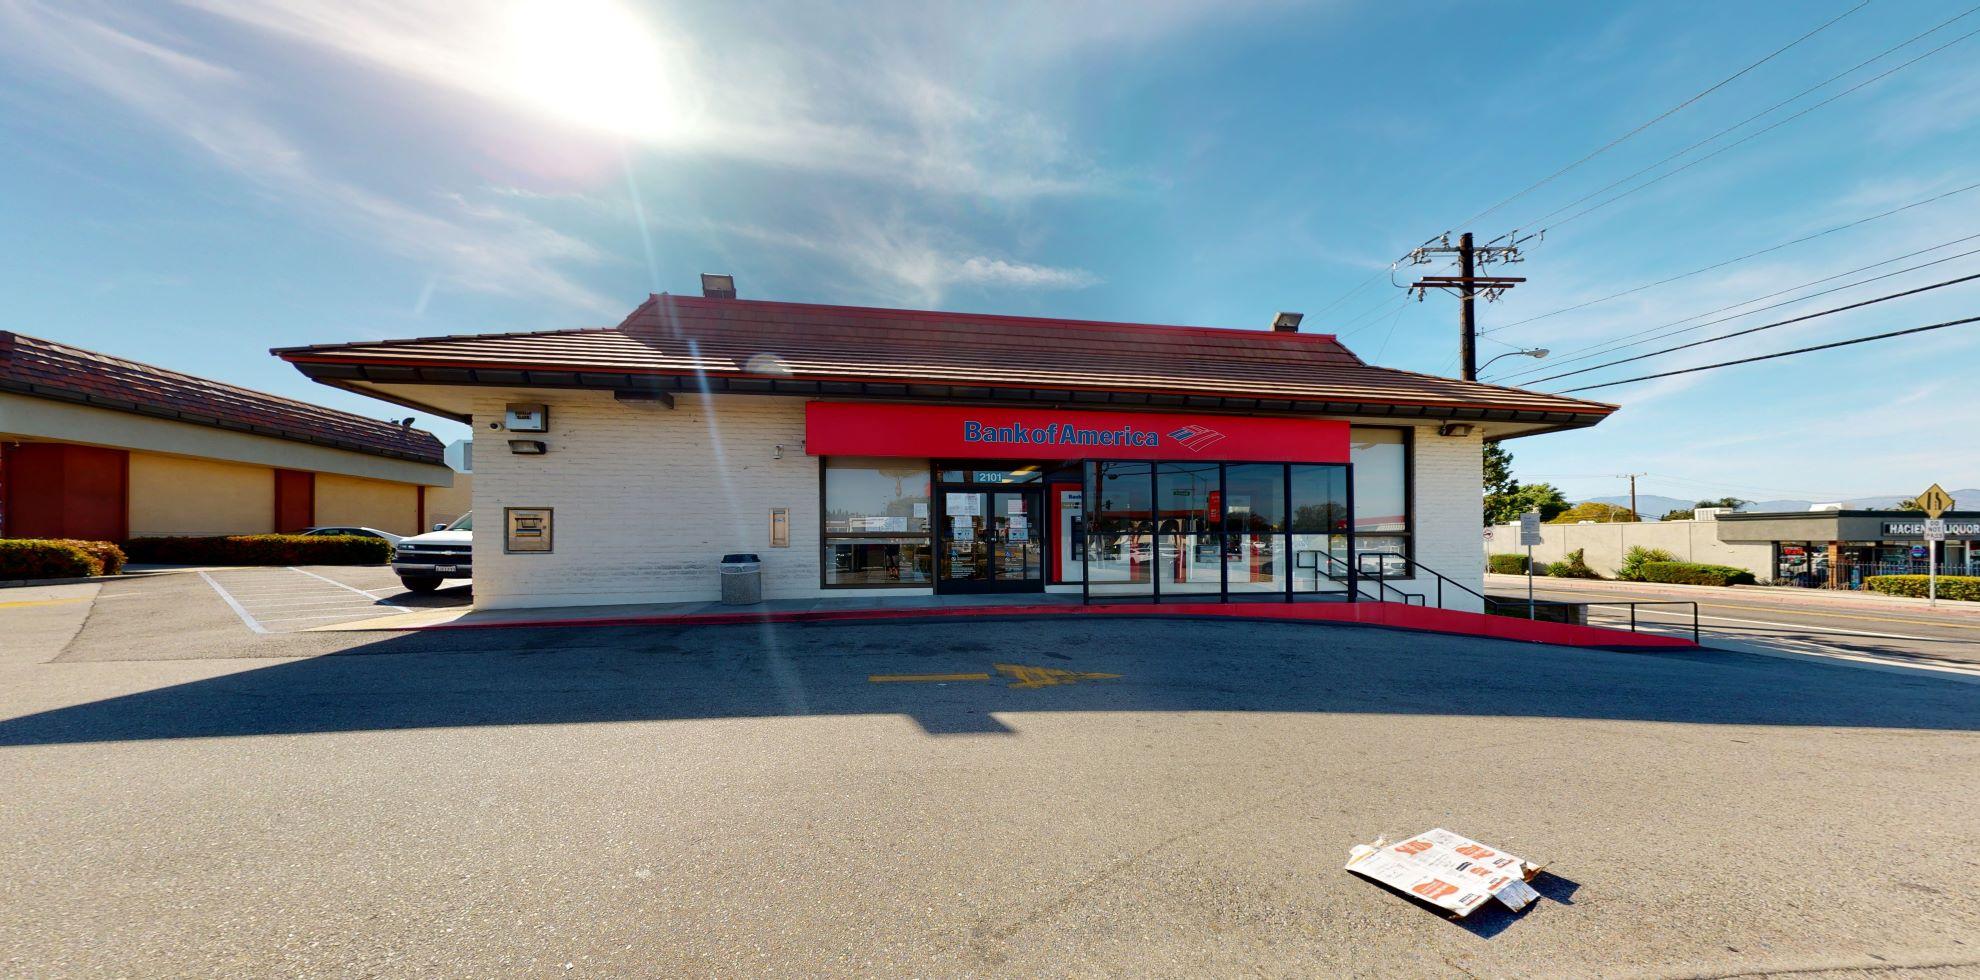 Bank of America financial center with drive-thru ATM   2101 S Hacienda Blvd, Hacienda Heights, CA 91745